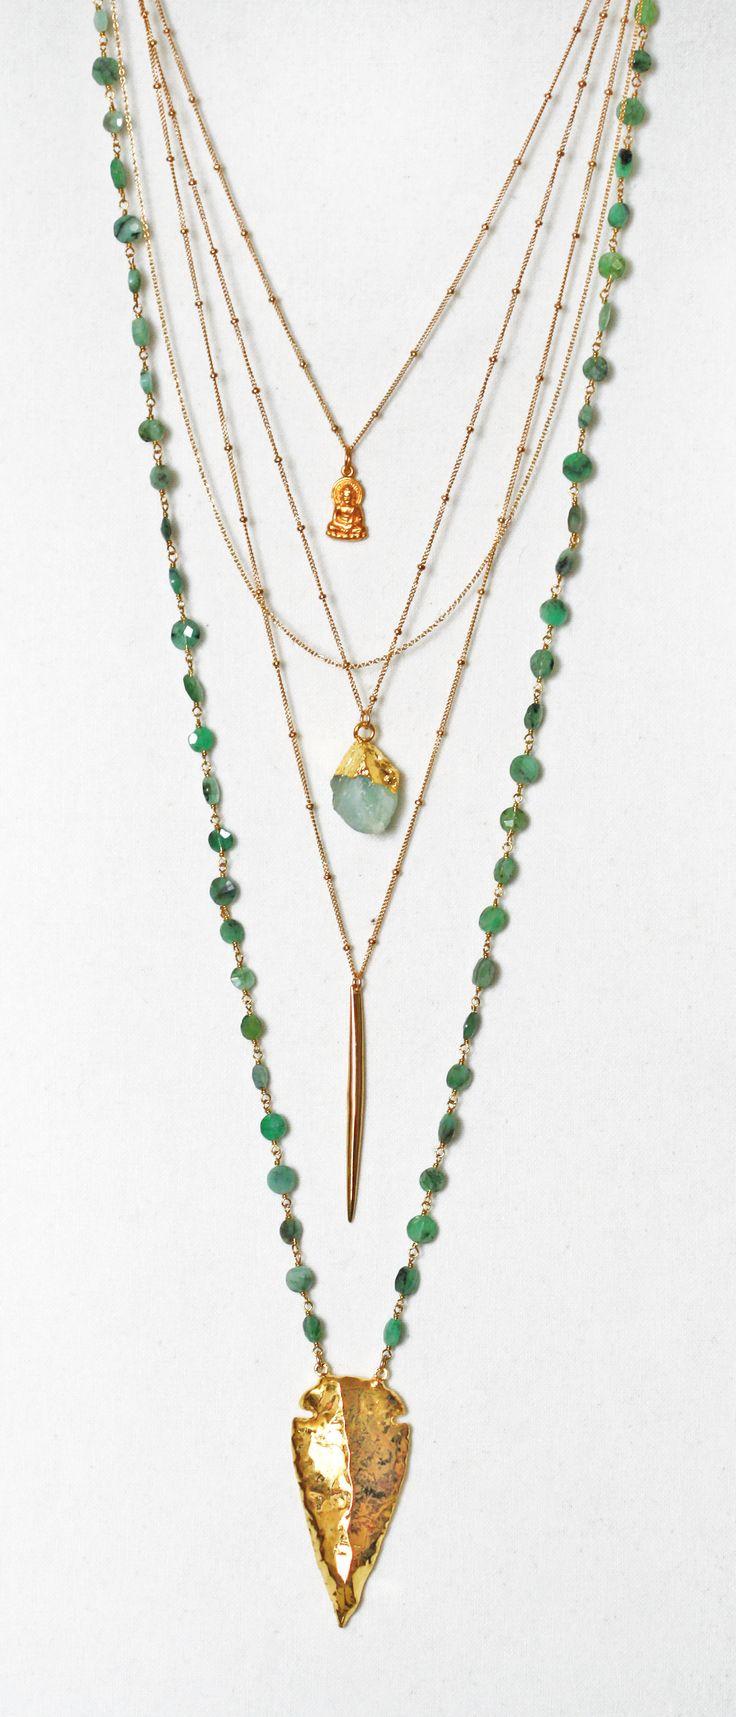 green + gold layered chains | kei jewelry